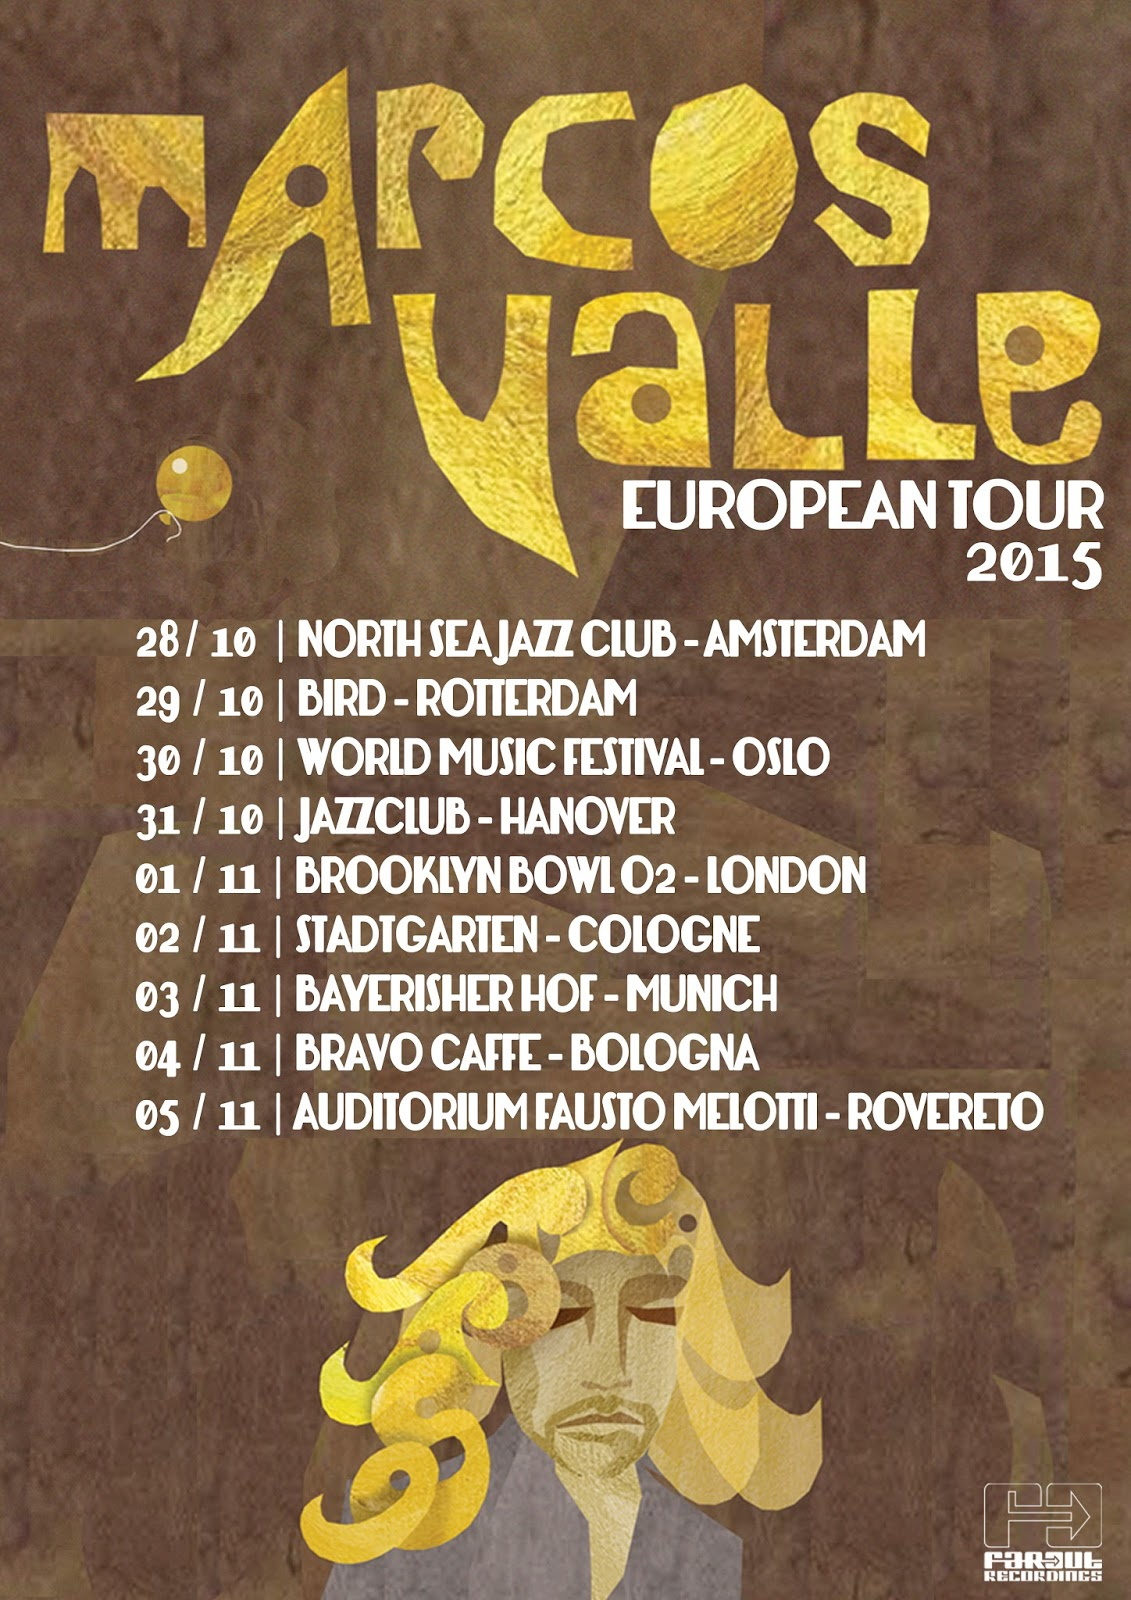 Marcos Valle EU Tour Poster